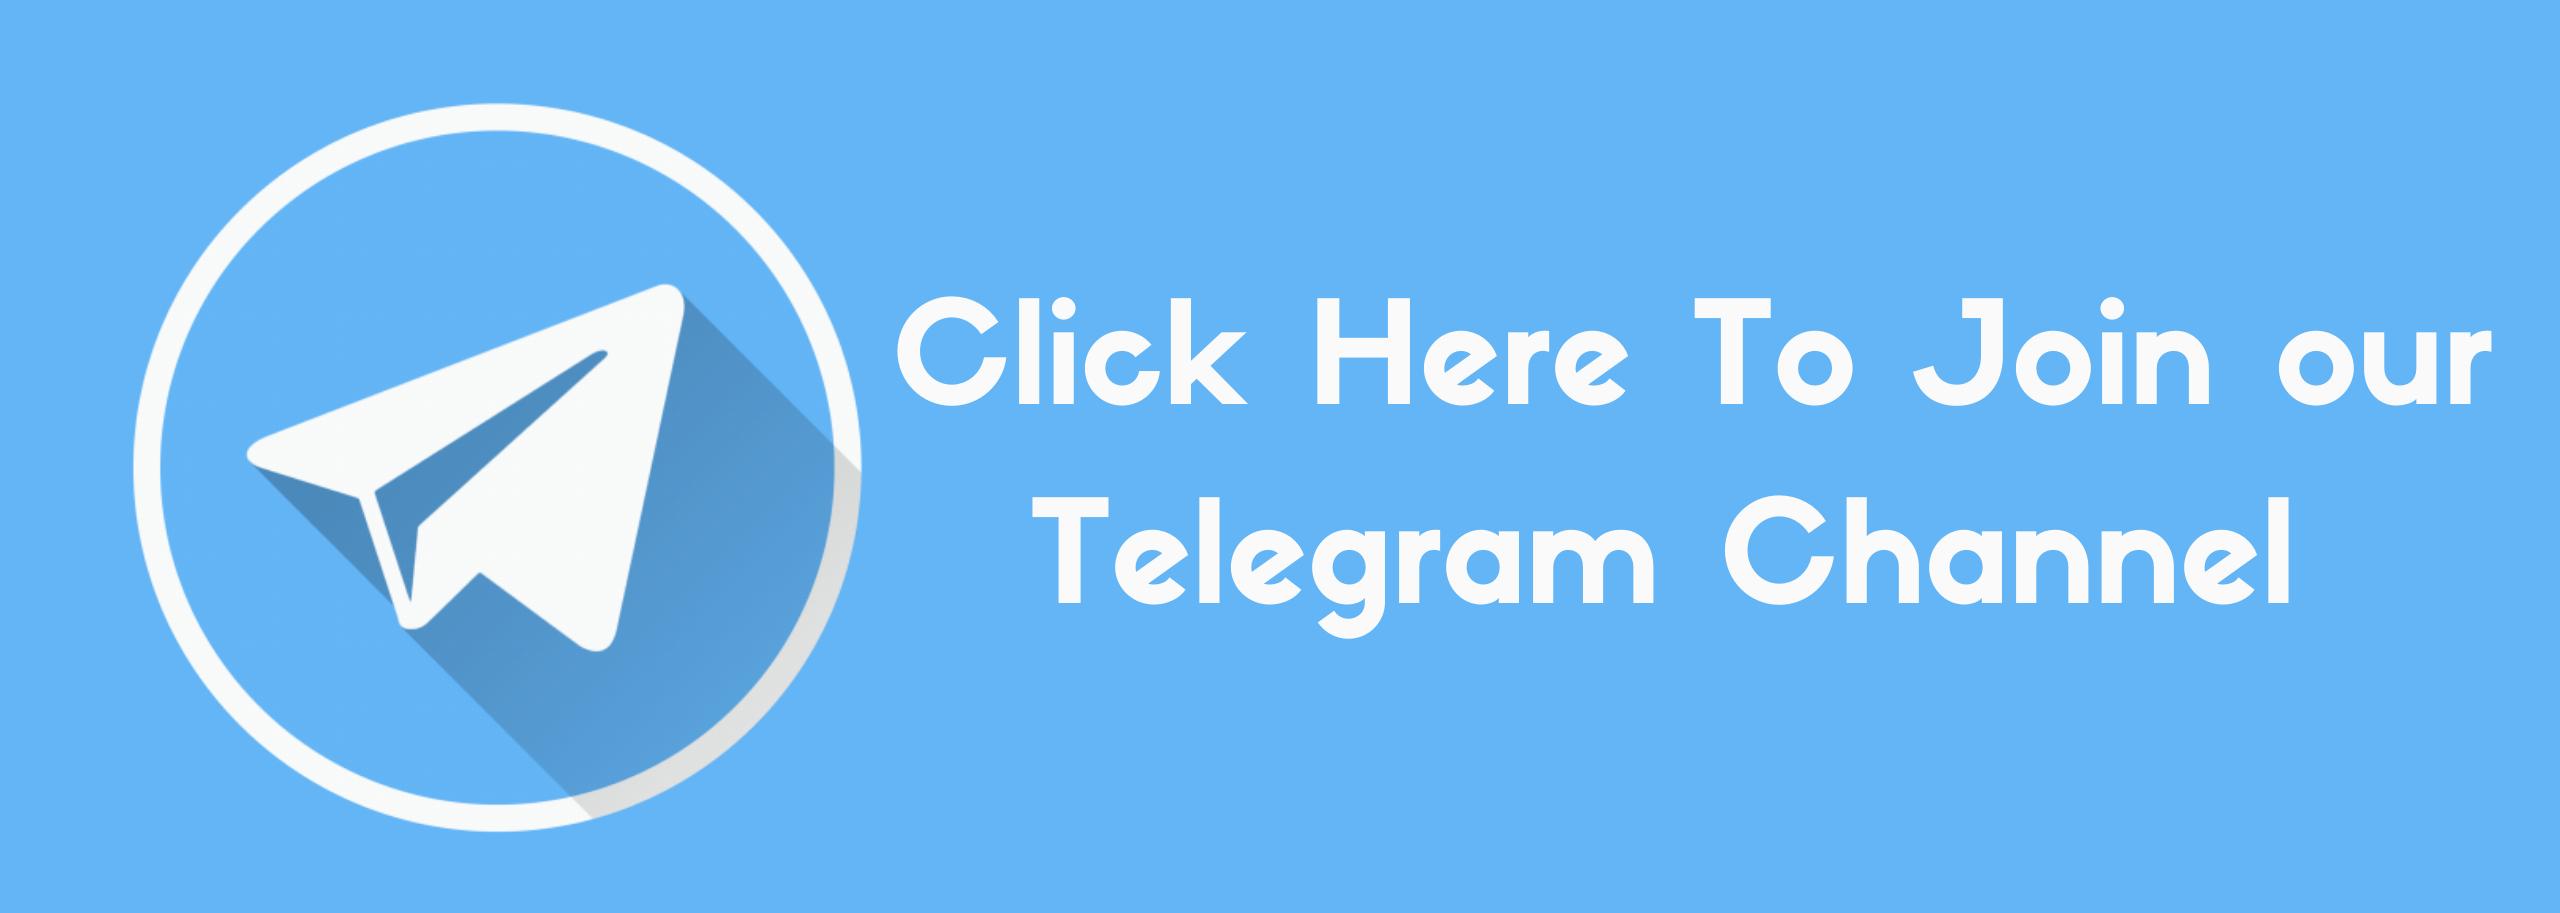 Telegram Channel Banner edited